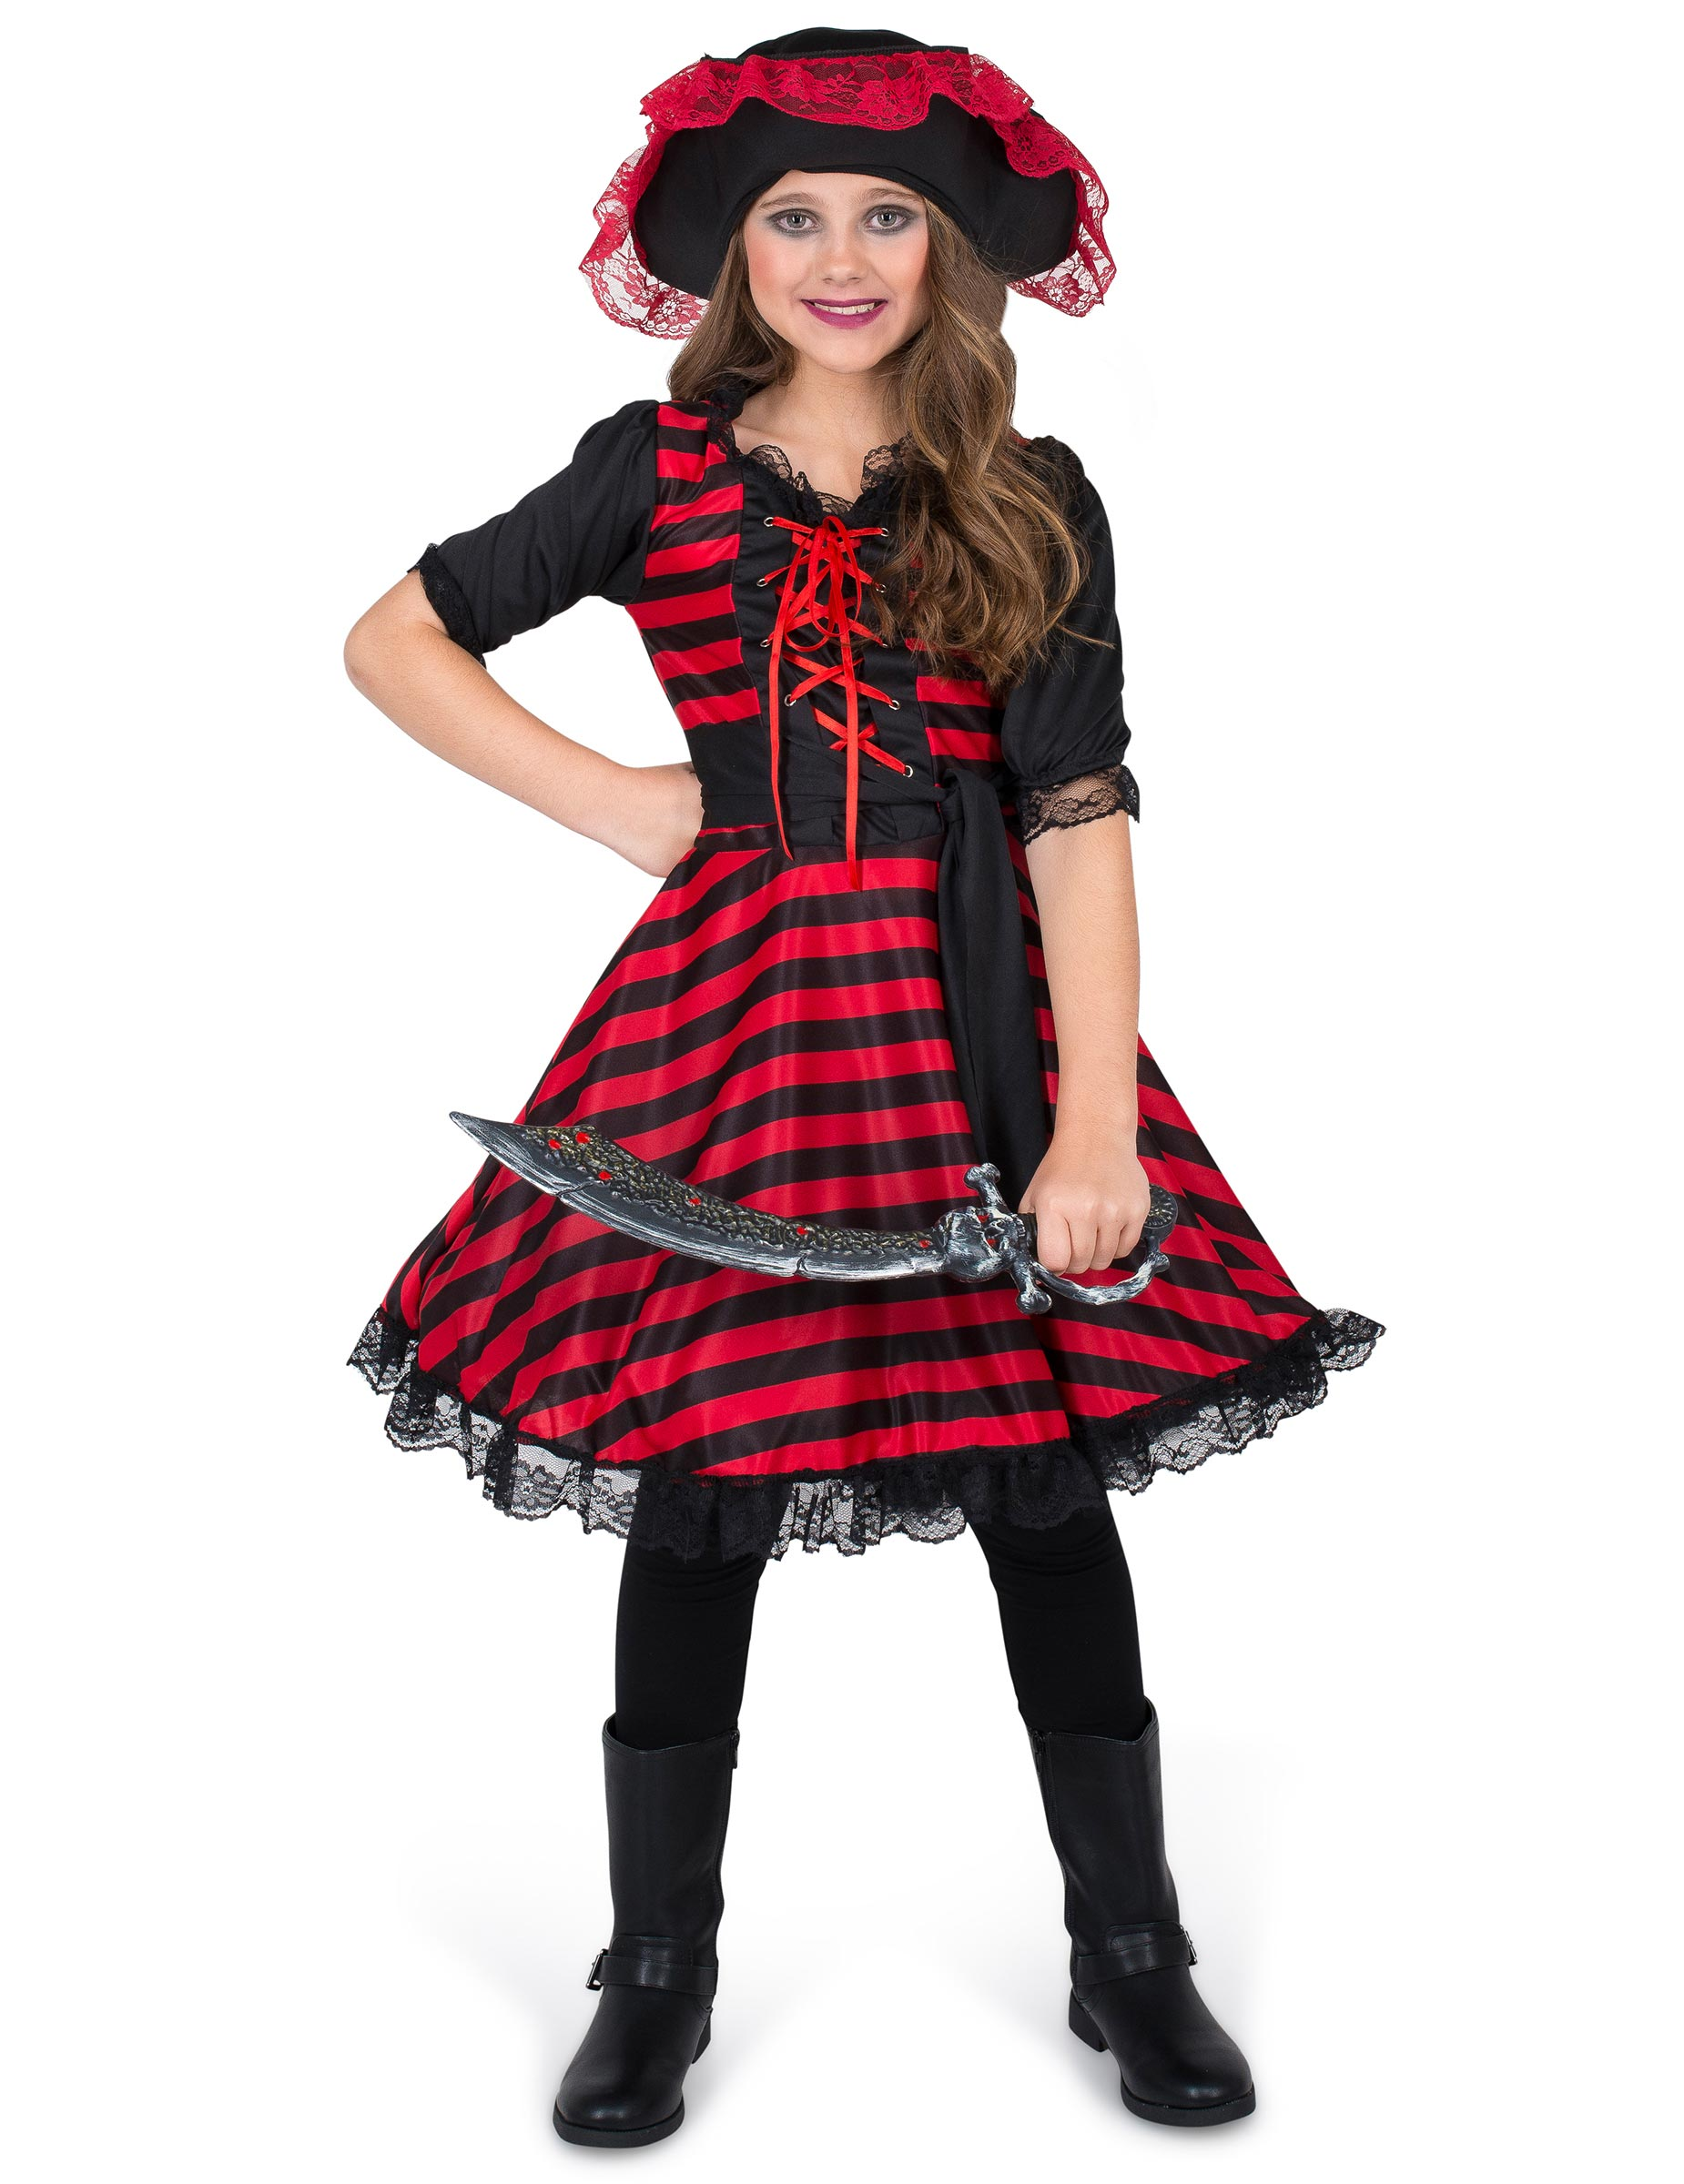 elegante piratin kinderkost m f r m dchen rot schwarz g nstige faschings kost me bei karneval. Black Bedroom Furniture Sets. Home Design Ideas